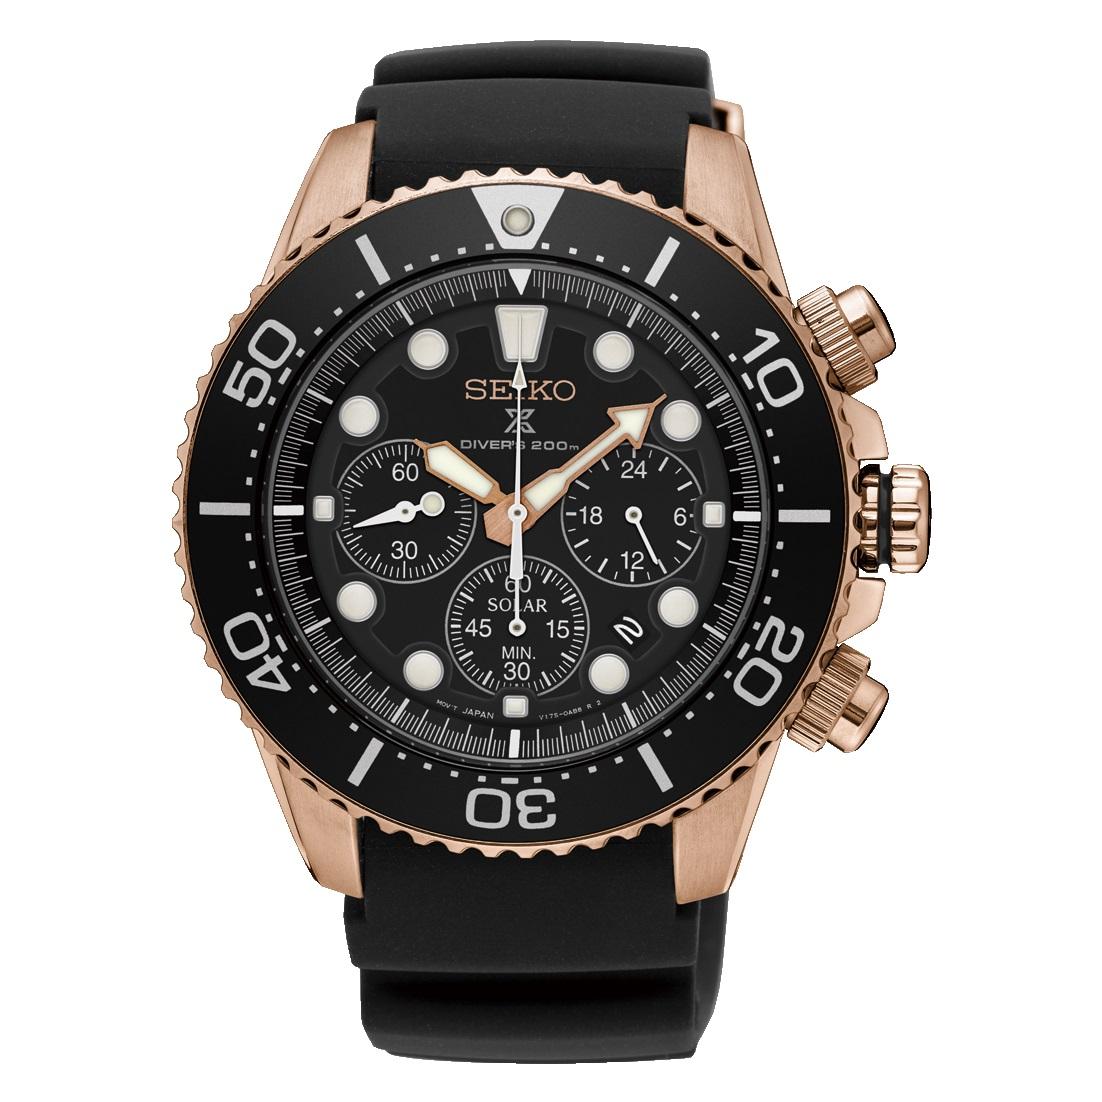 ساعت مچی عقربه ای مردانه سیکو  مدل   SSC618P1 50